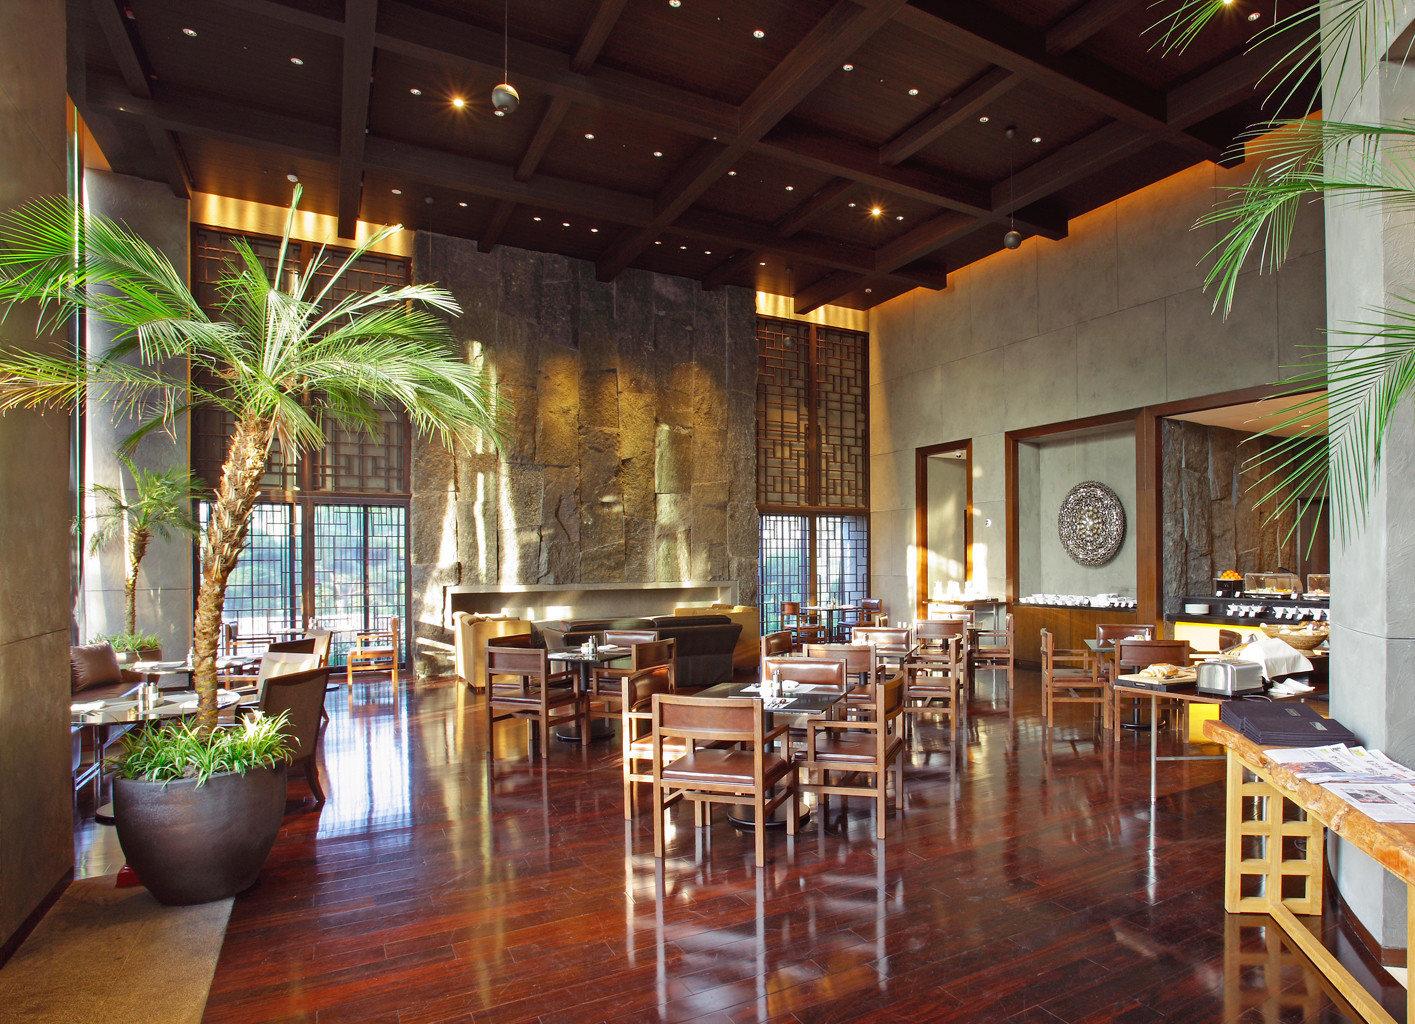 Cultural Drink Eat Hotels Luxury Travel Modern Lobby restaurant Dining Resort function hall Bar